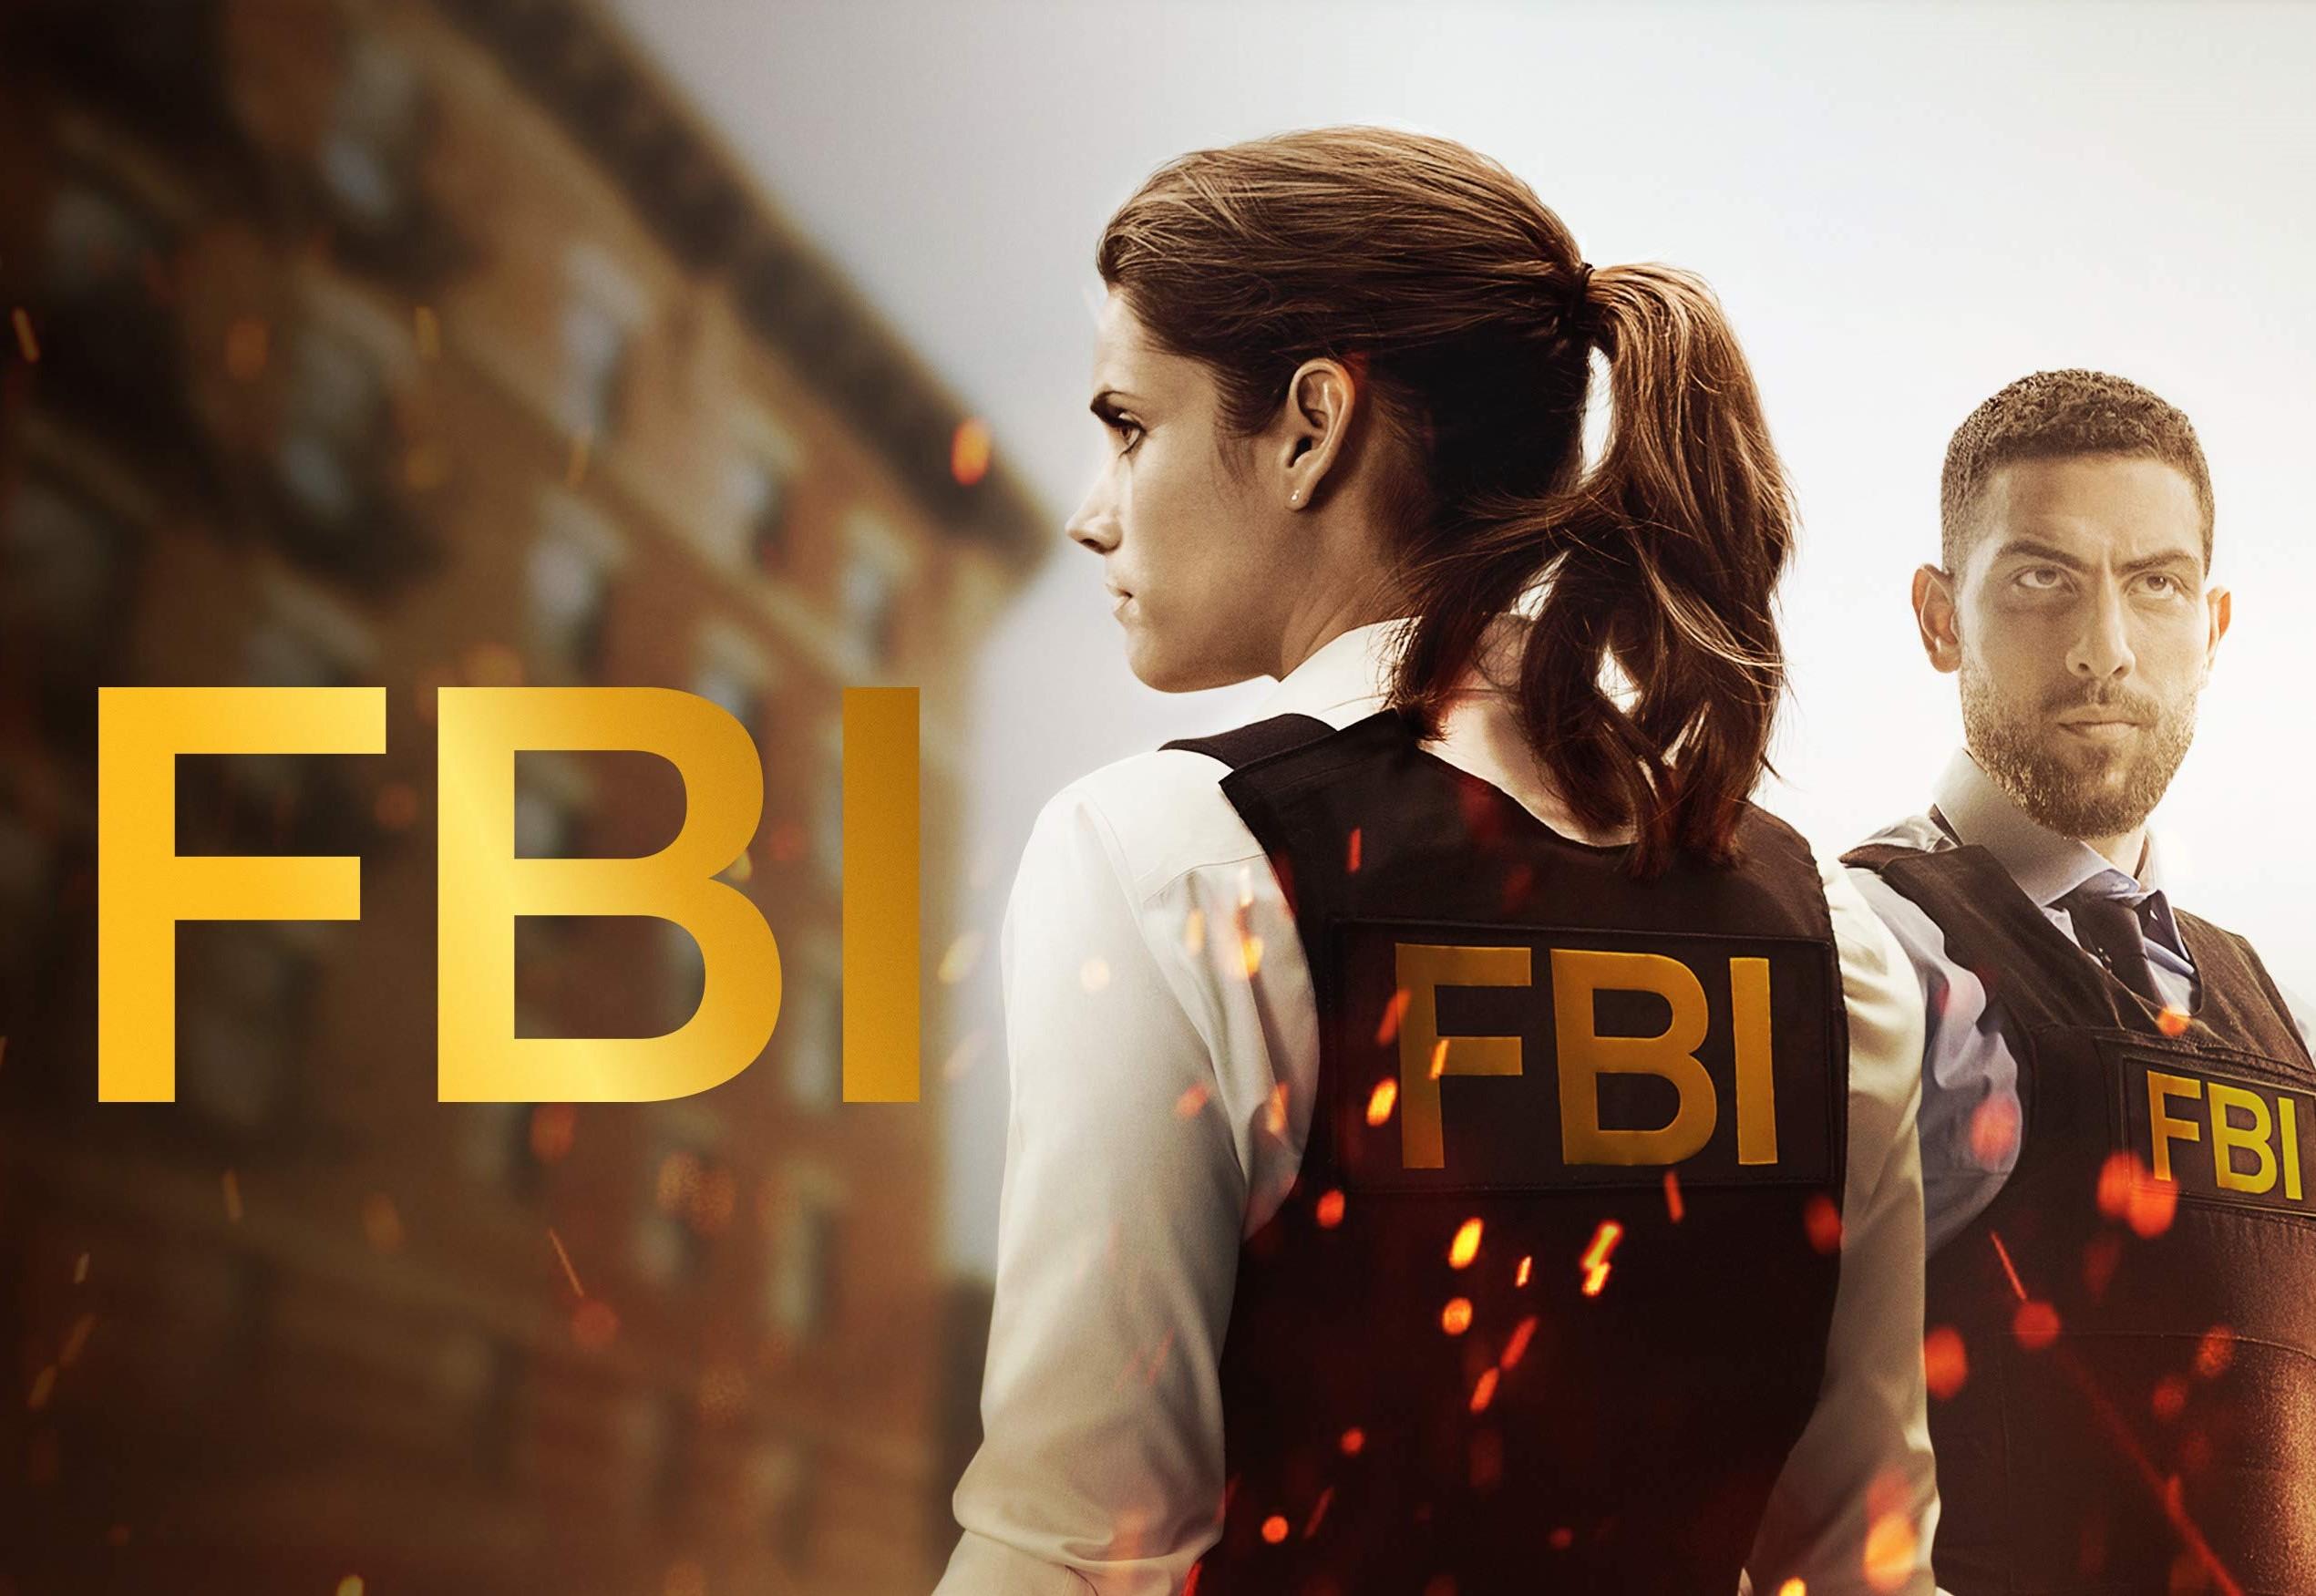 FBI - Featured Image